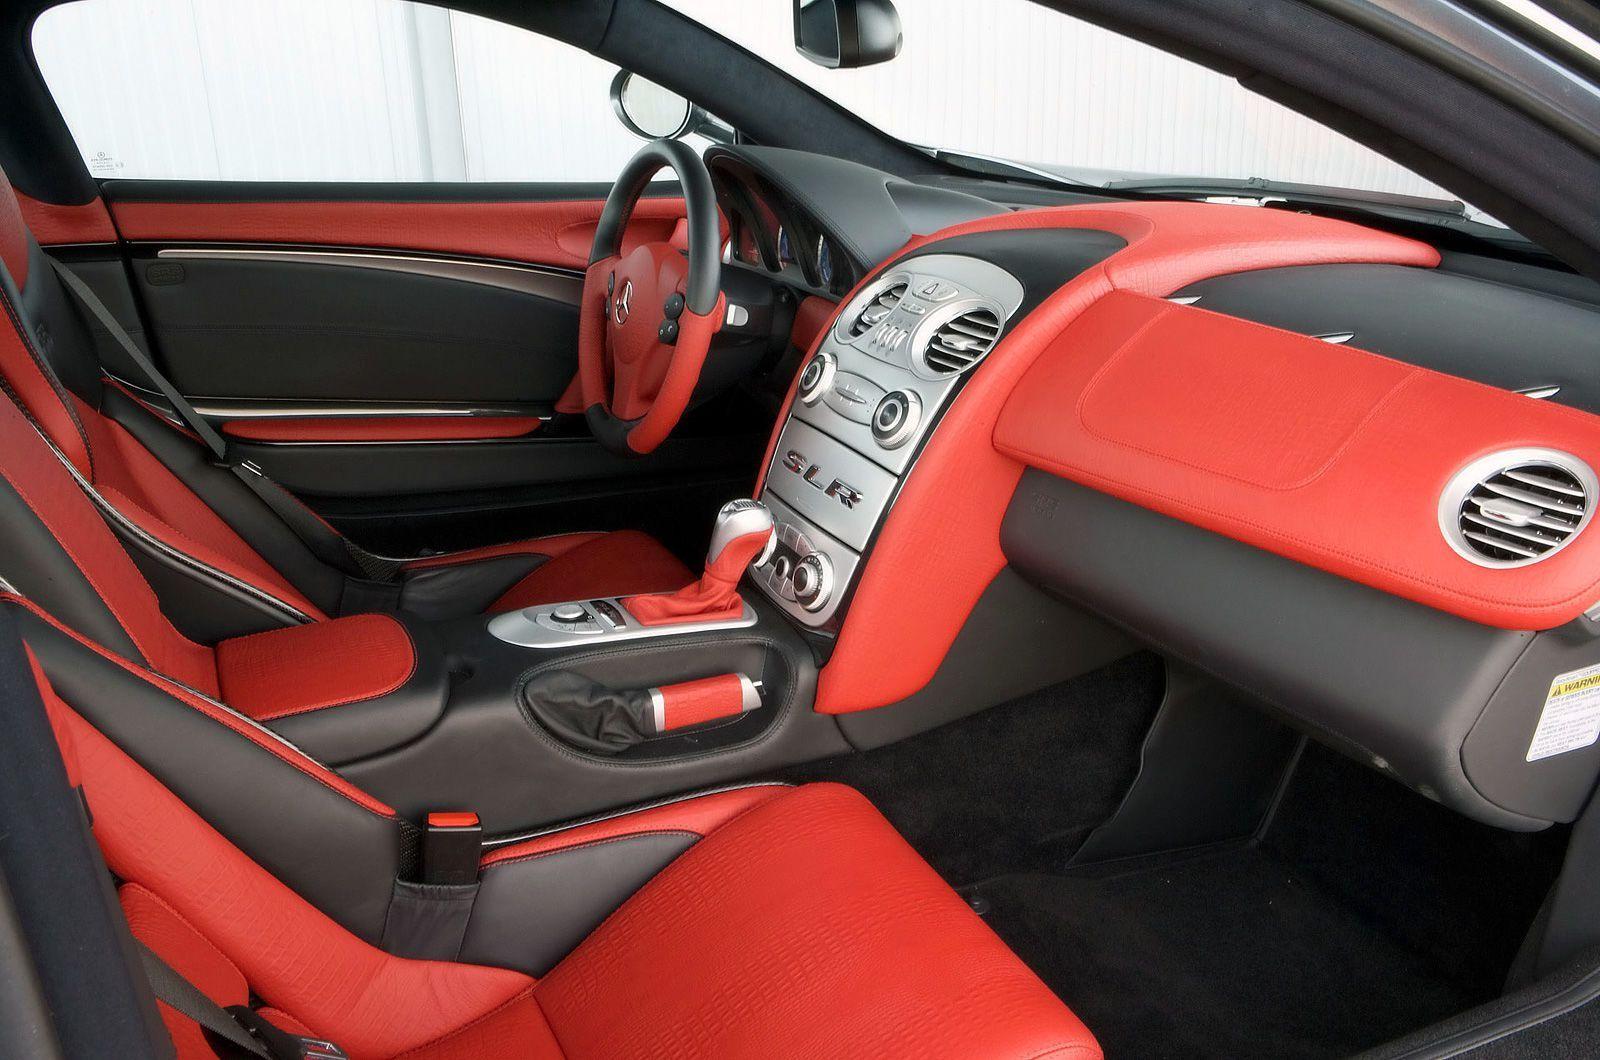 Custom Car Interior Design - http://cermai.xyz/073919/custom-car-interior-design/743/